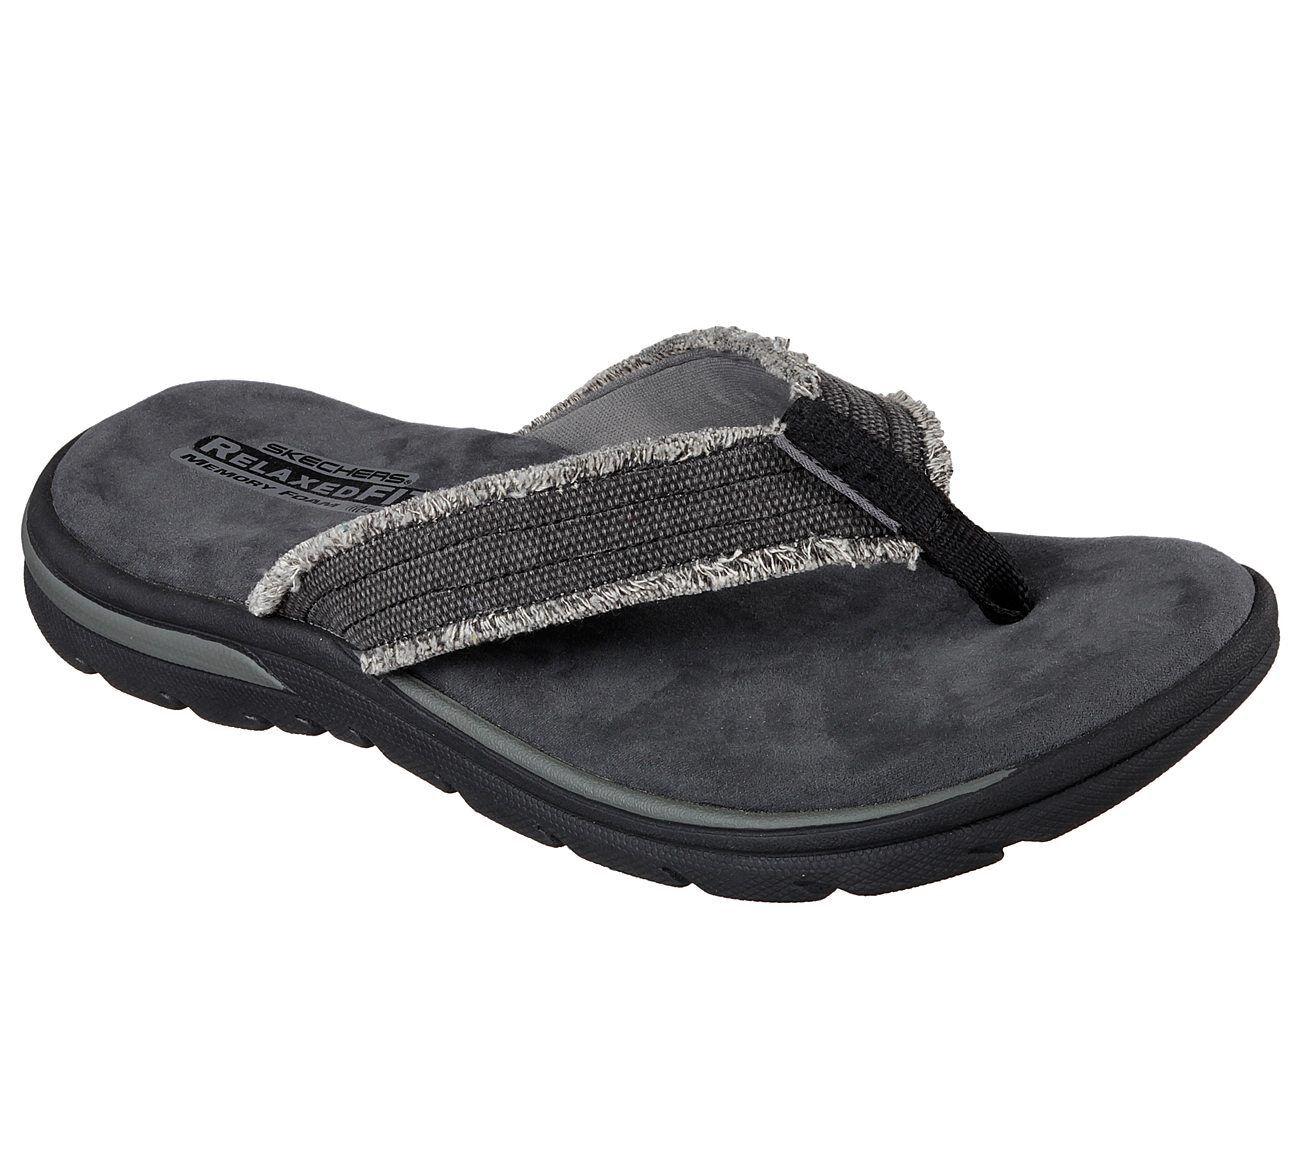 Men's Skechers Relaxed Fit: Supreme - Bosnia Sandals, 64152 /BLK Multiple Sizes